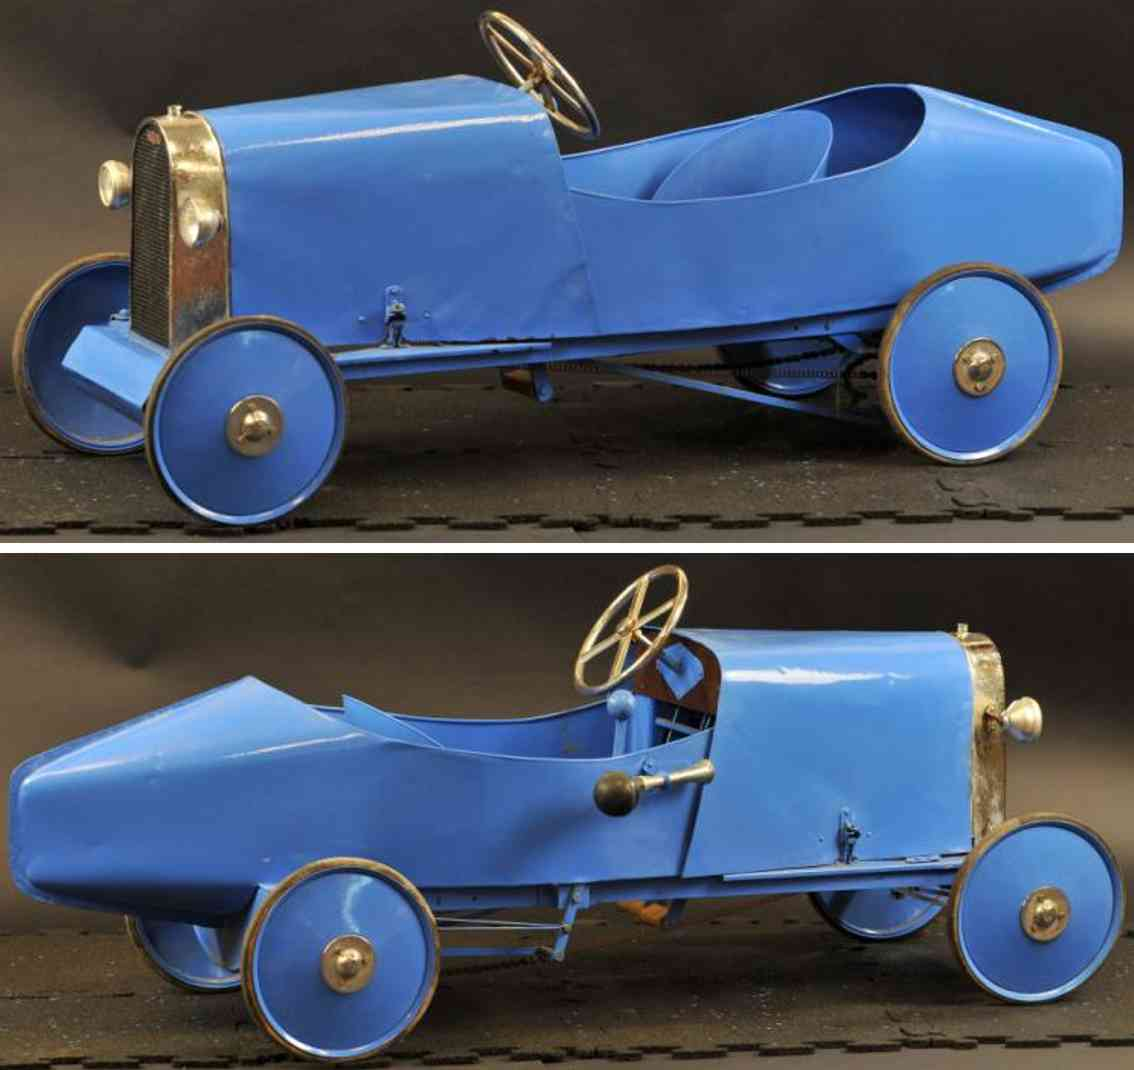 eureka brevete sgdg stahlblech rennwagen tretauto blau